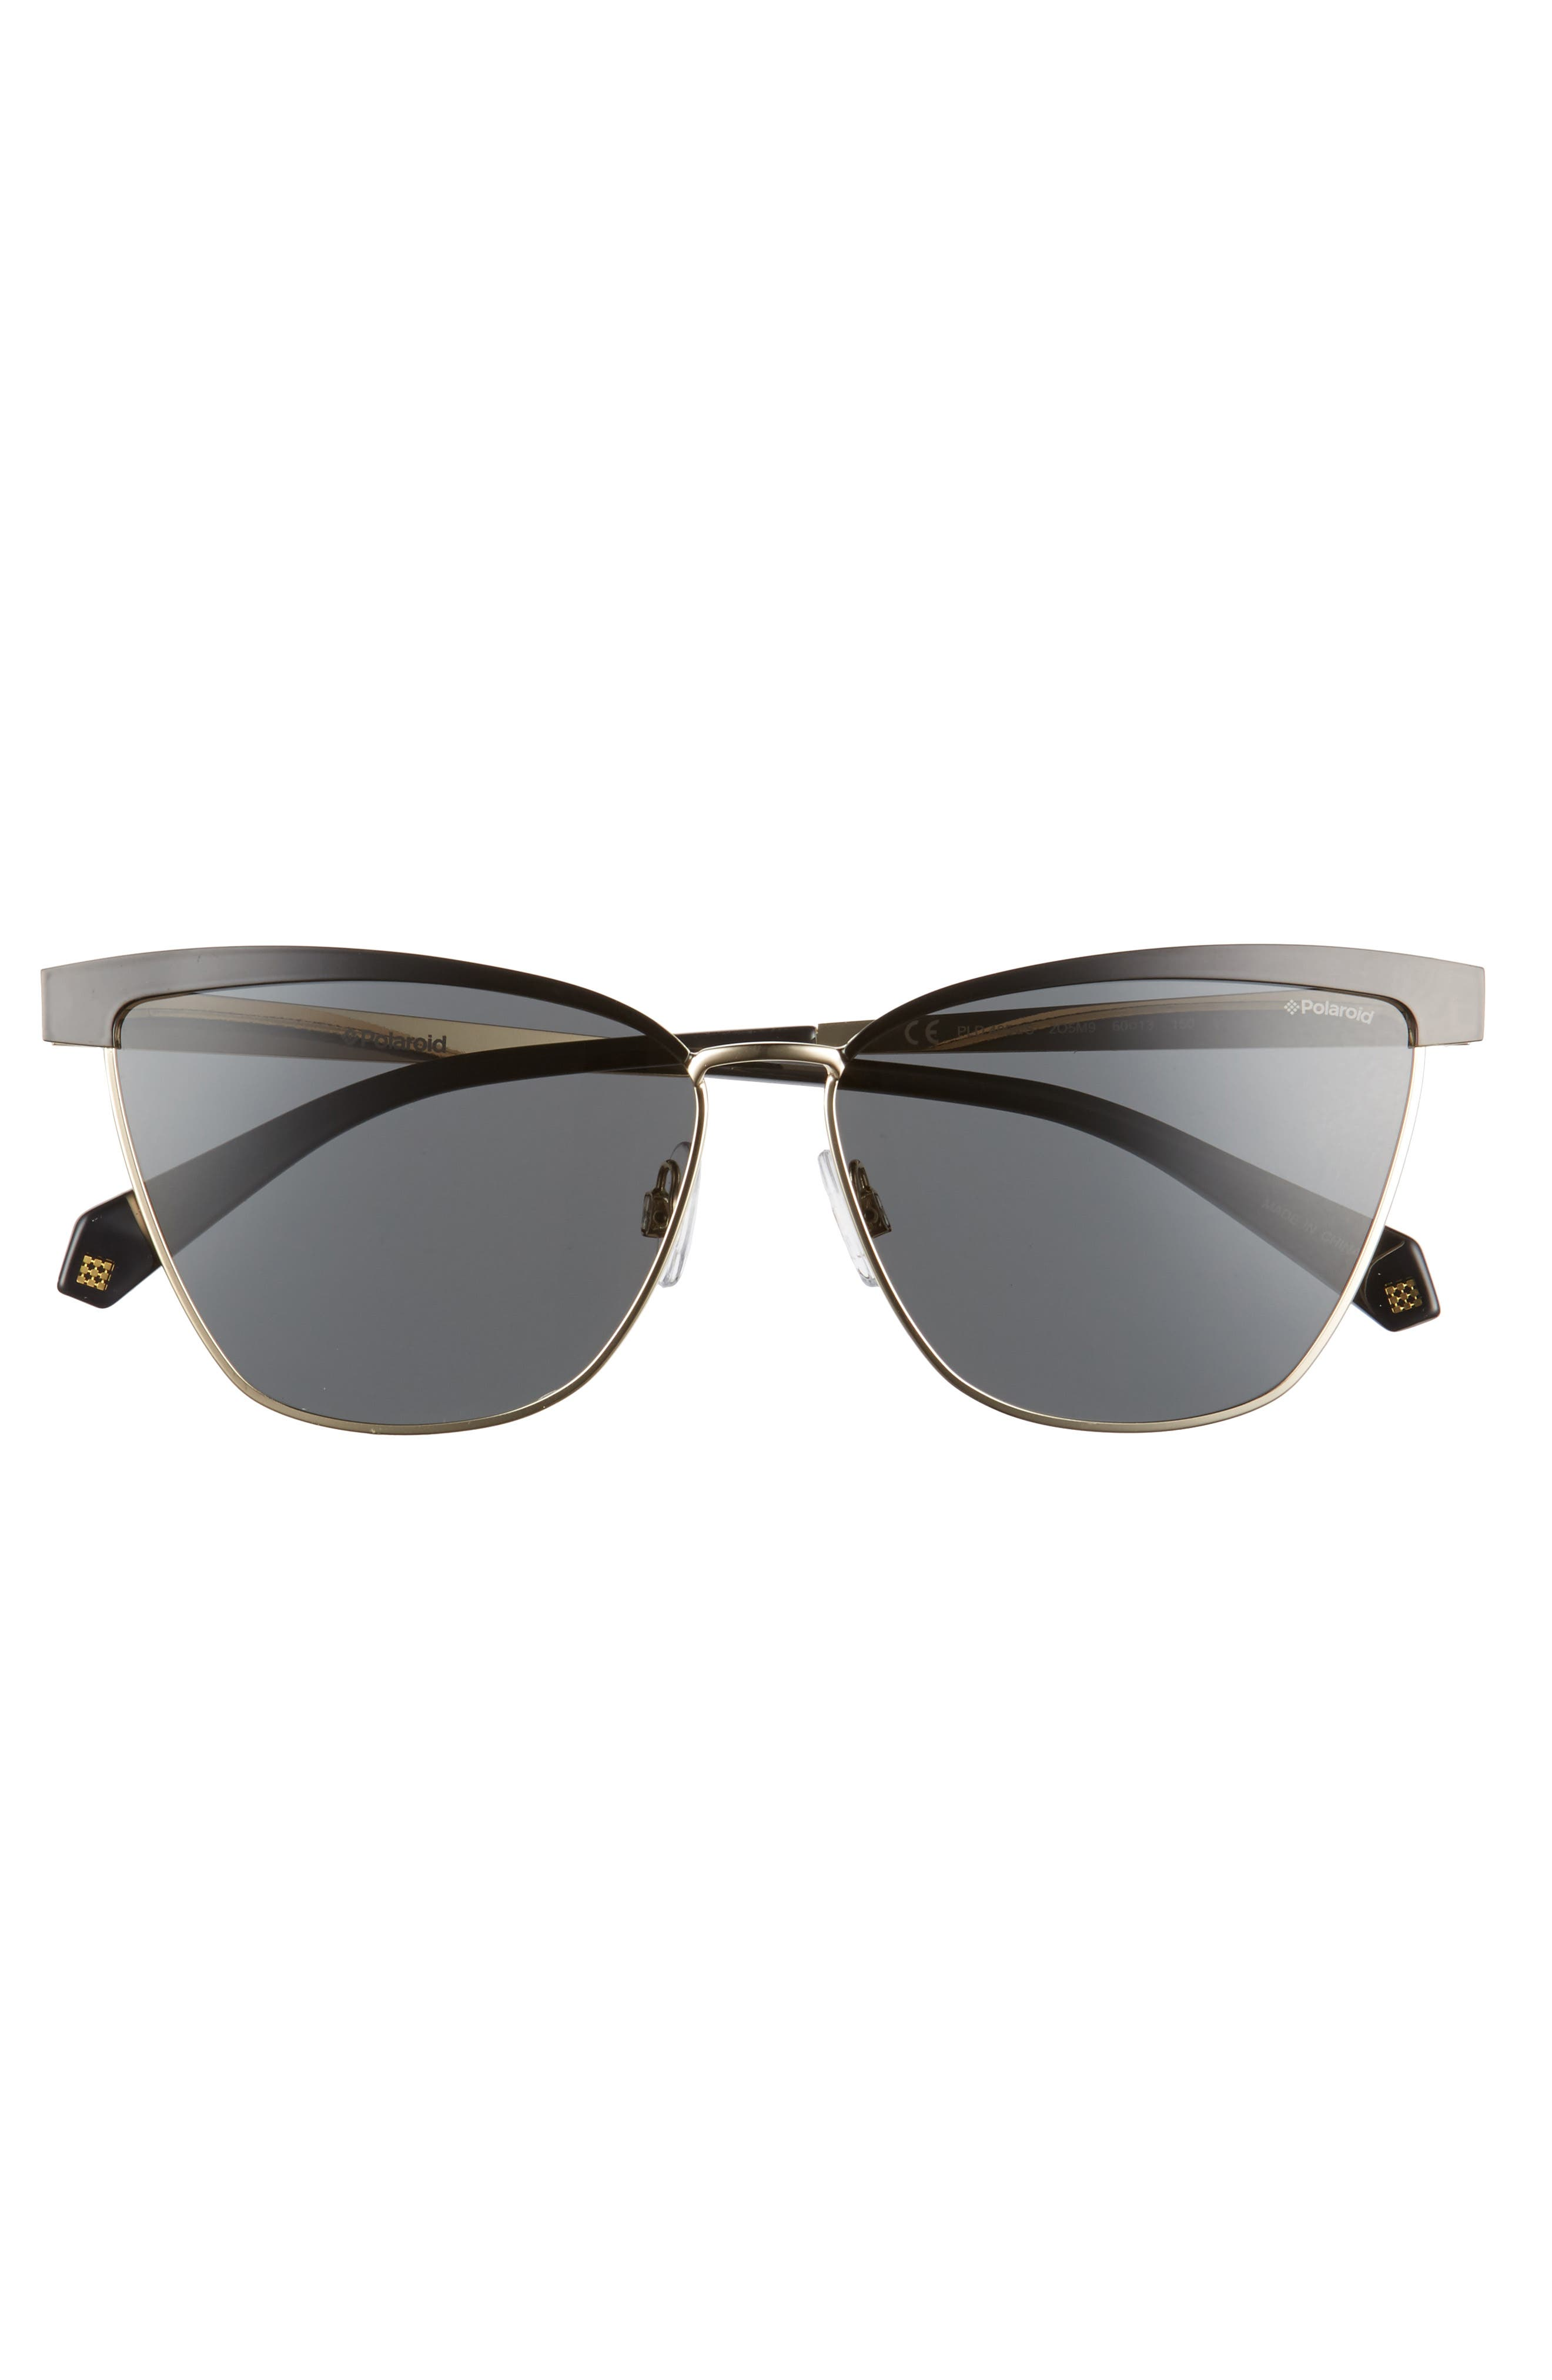 60mm Polarized Cat Eye Sunglasses,                             Alternate thumbnail 5, color,